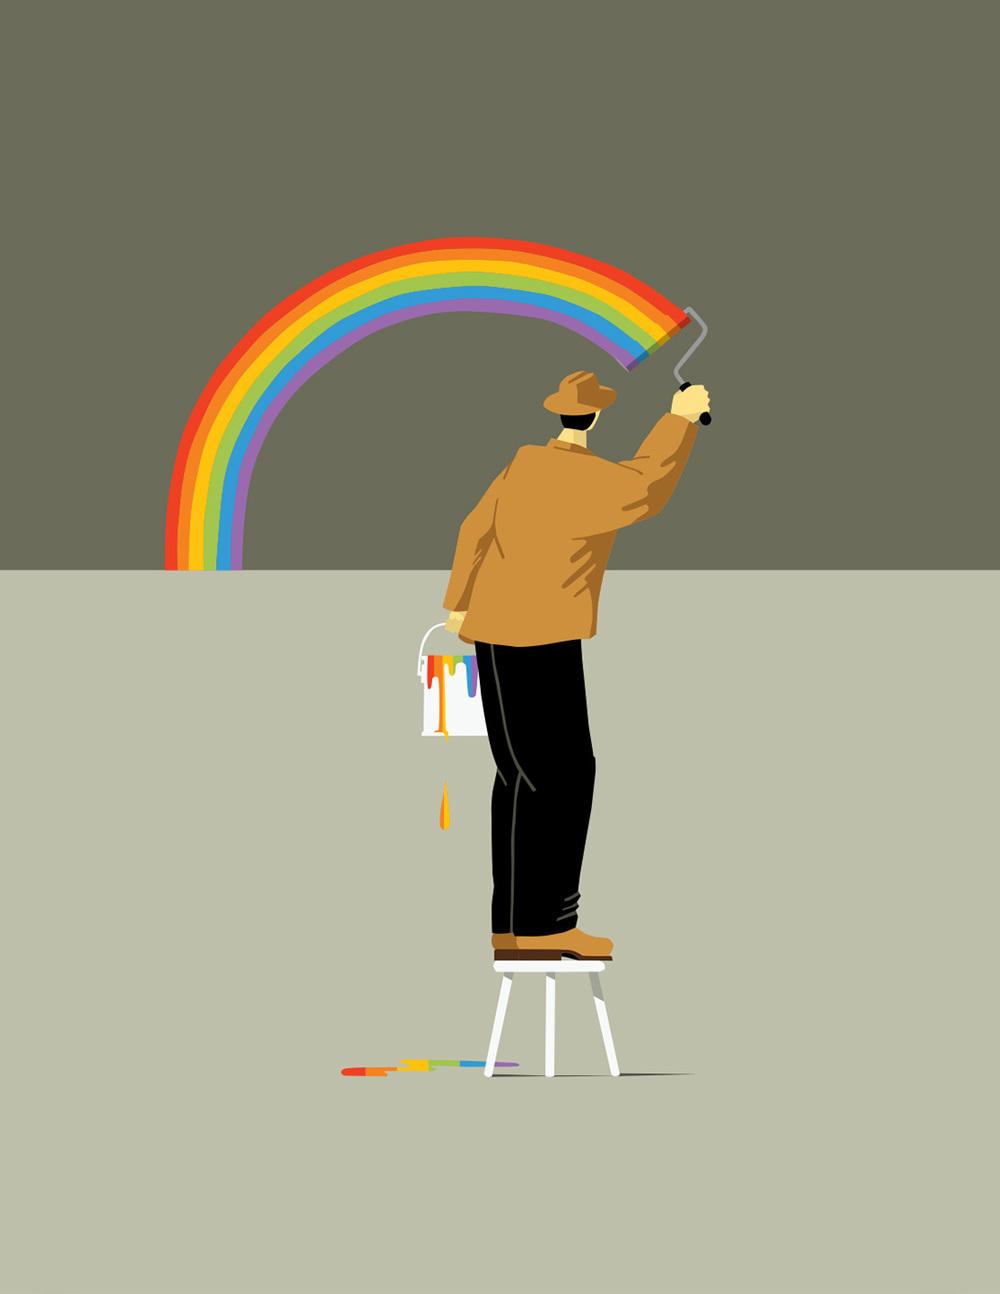 Rollerrainbow_web.jpg